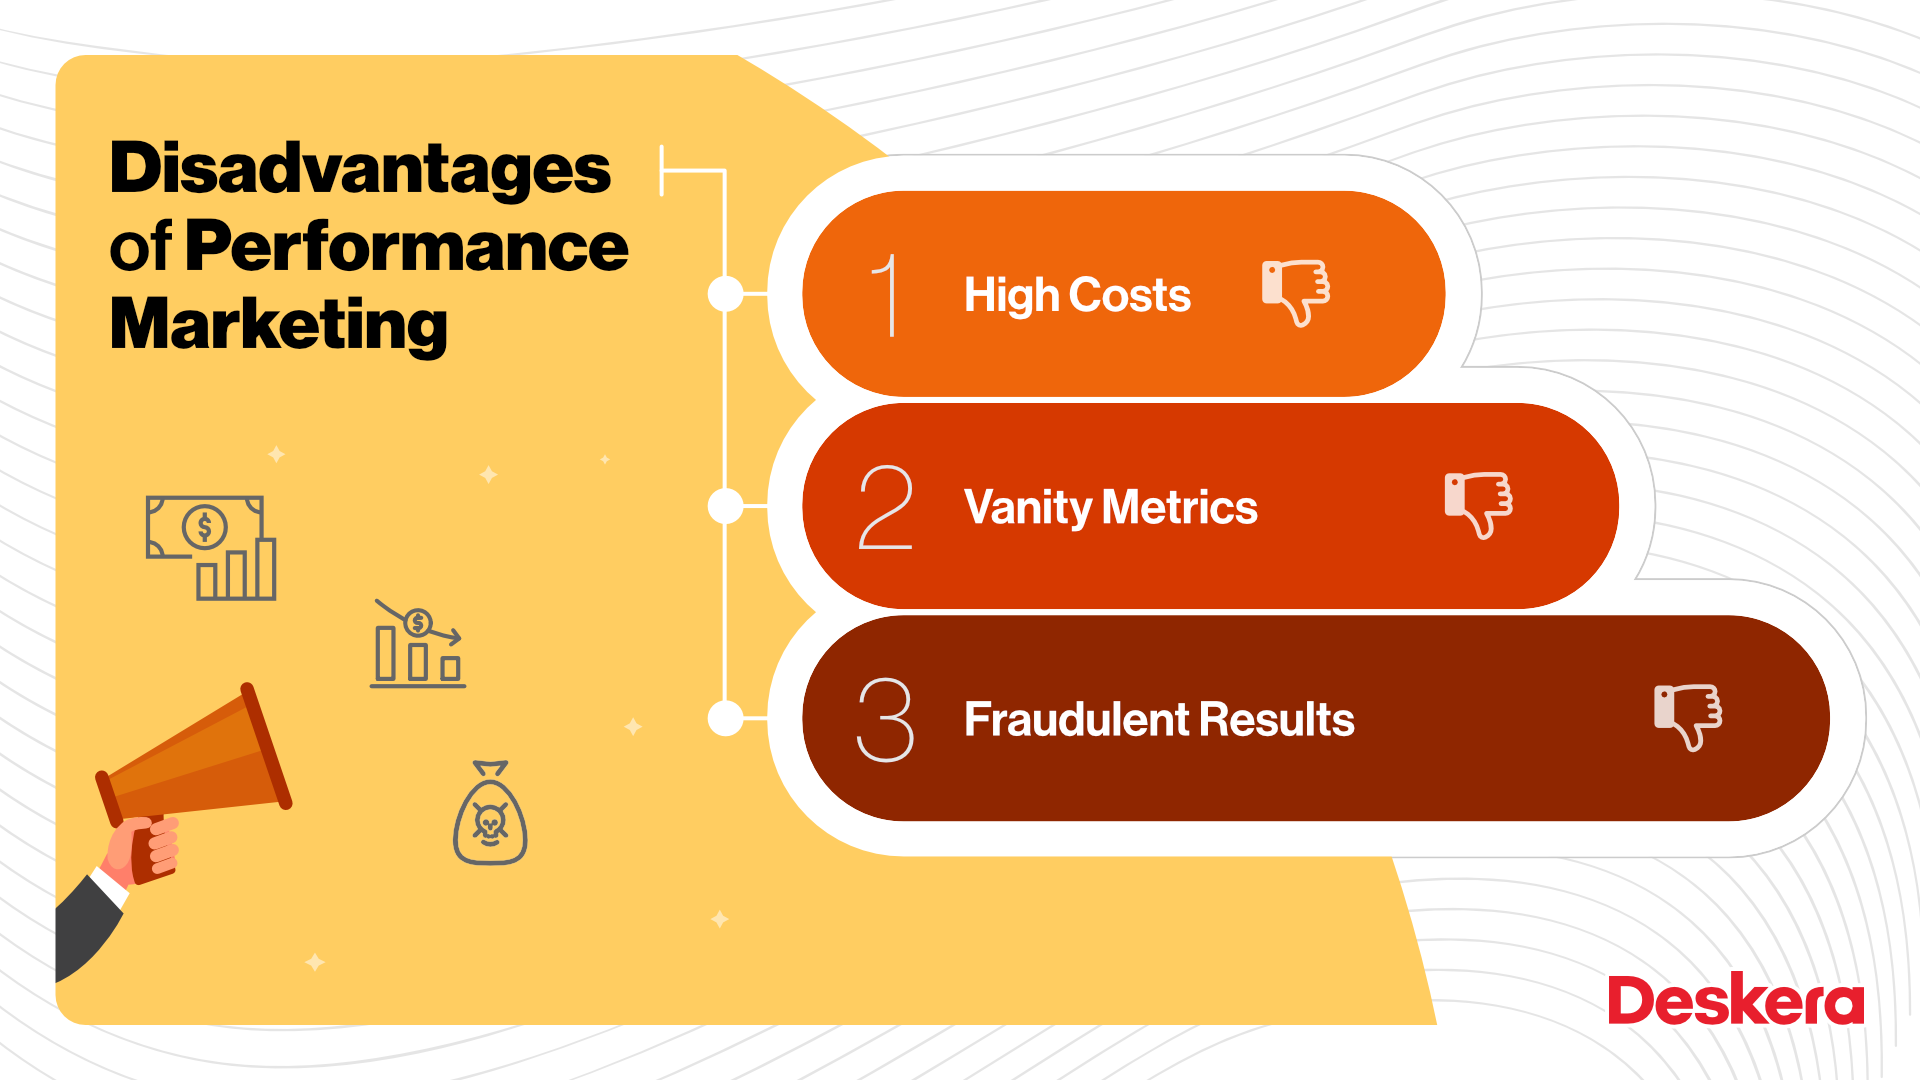 Disadvantages of Performance Marketing